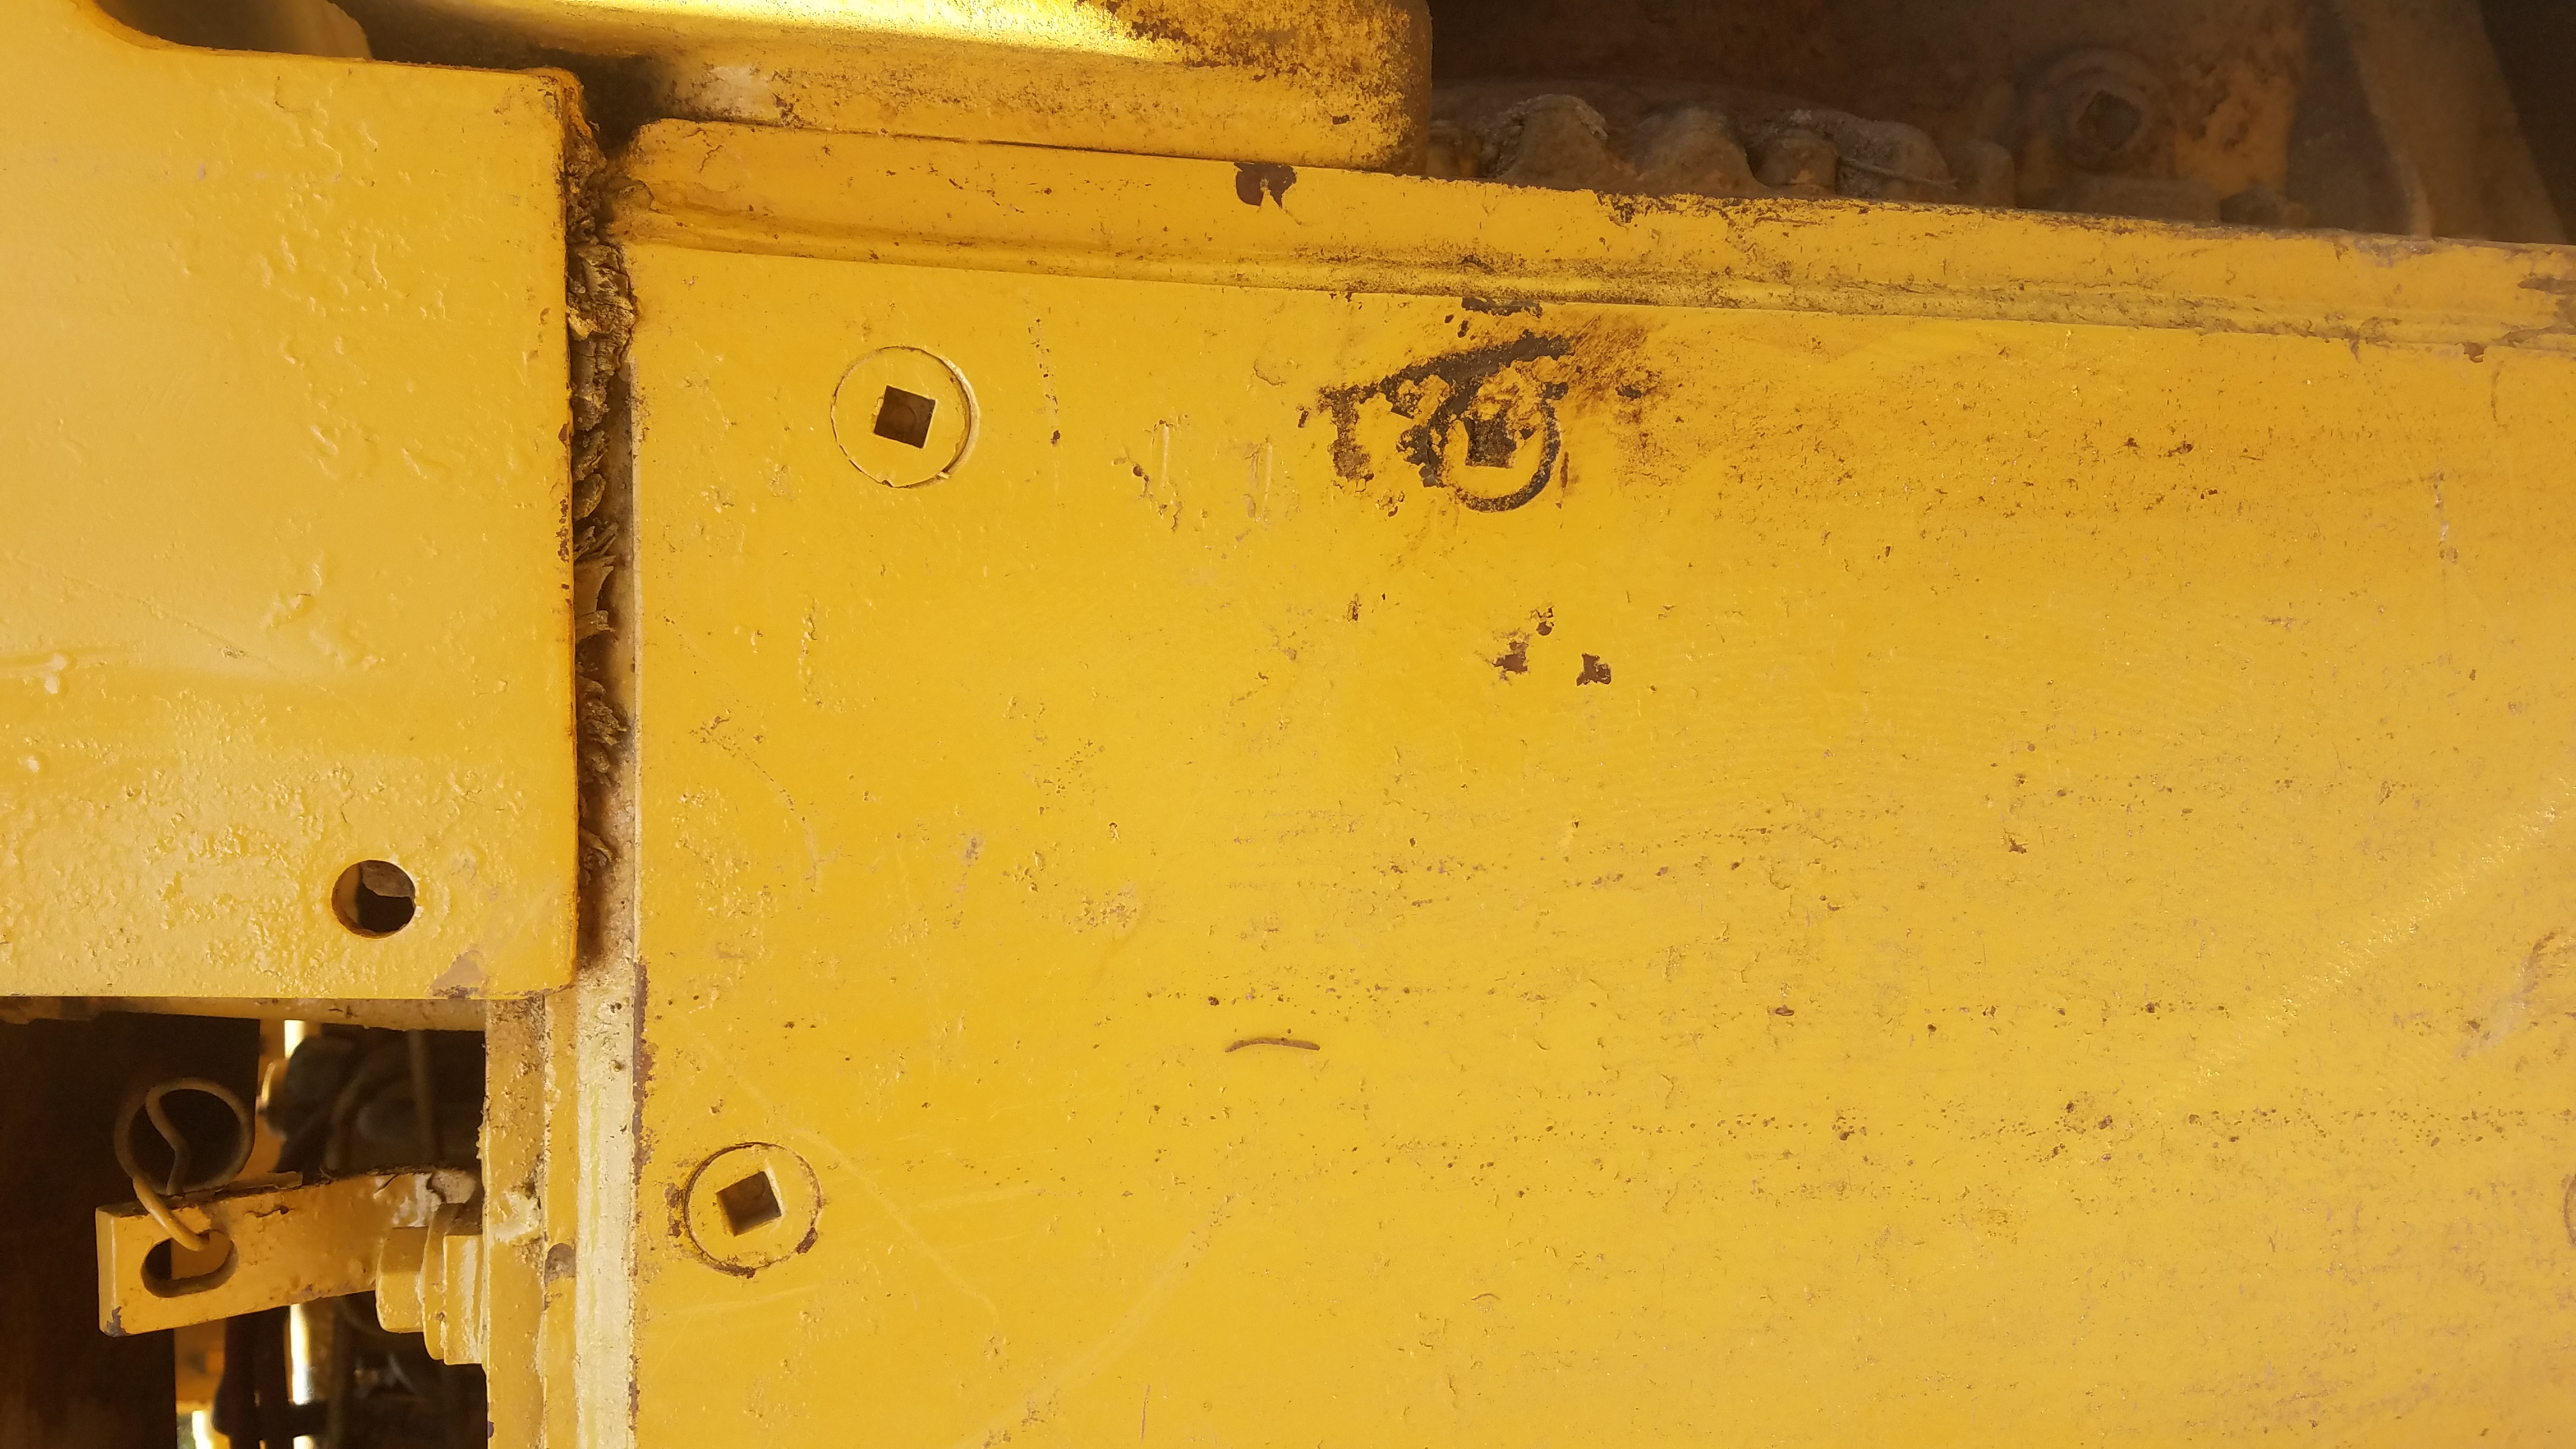 I have a 1991 d3c series 2 caterpillar bulldozer  I would